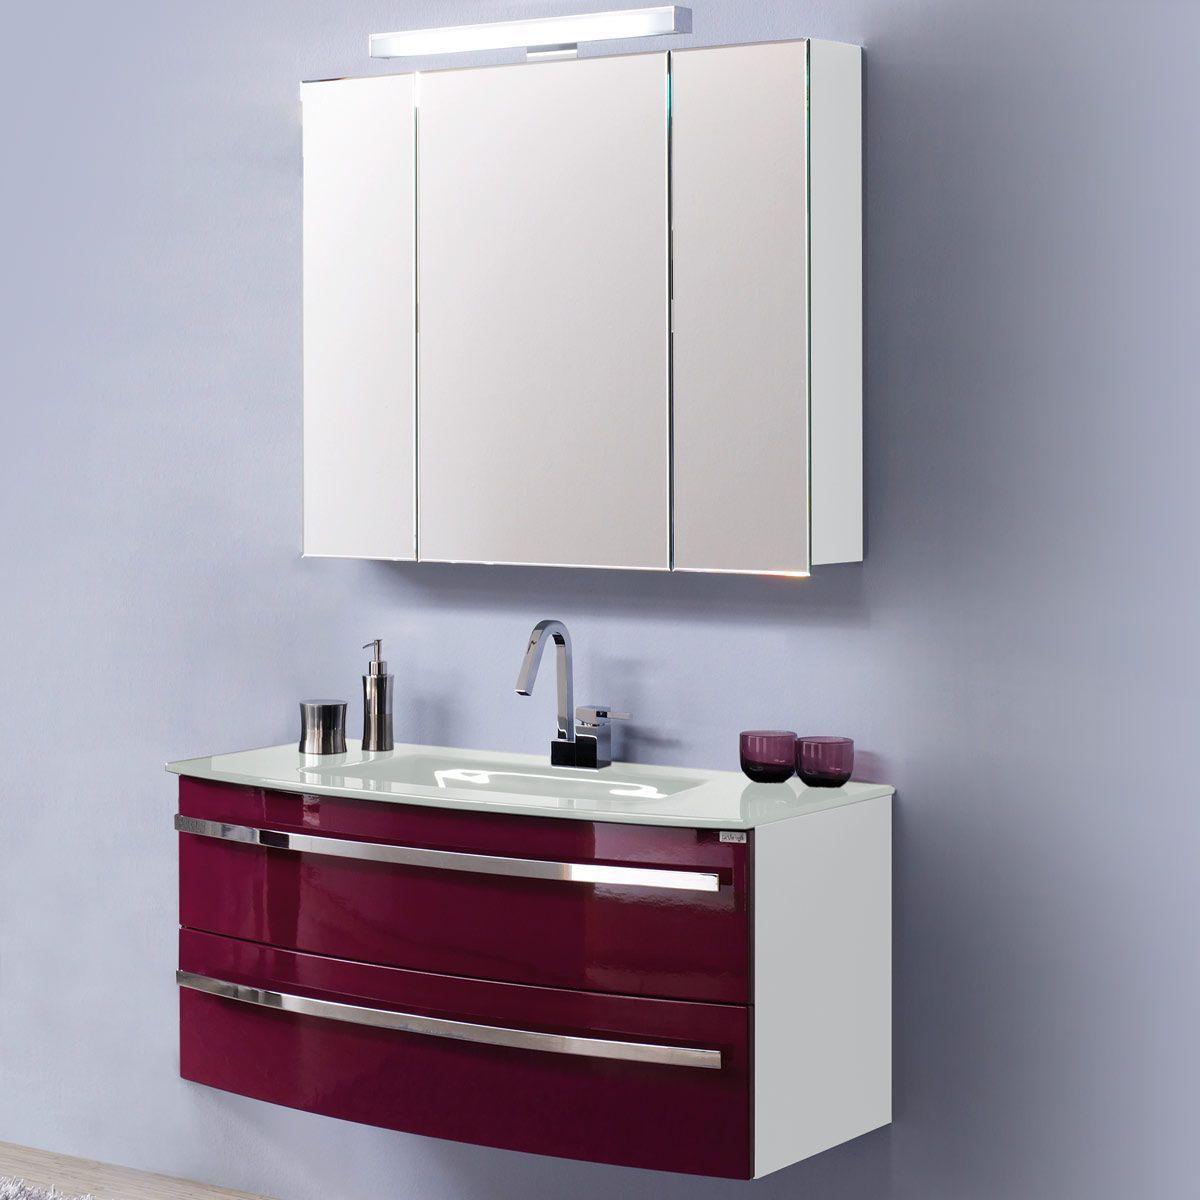 EEK A, Waschplatz Kingston - Weiß/ Hochglanz Brombeer, Aqua Suite ...